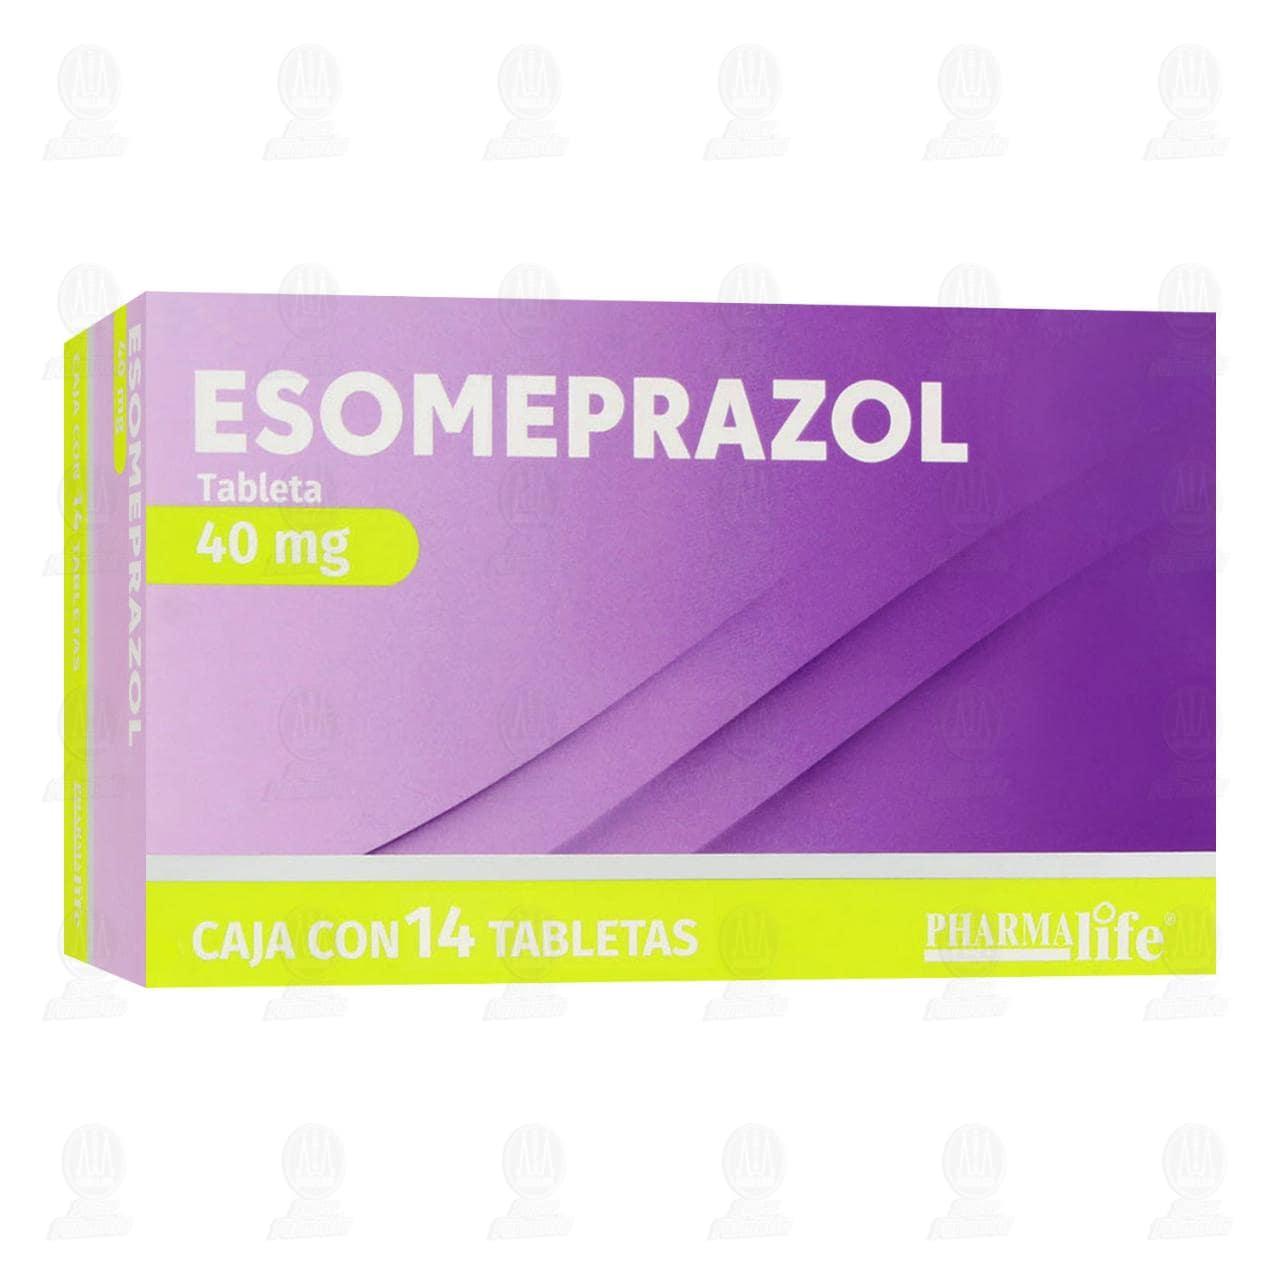 Comprar Esomeprazol 40mg 14 Tabletas Pharmalife en Farmacias Guadalajara